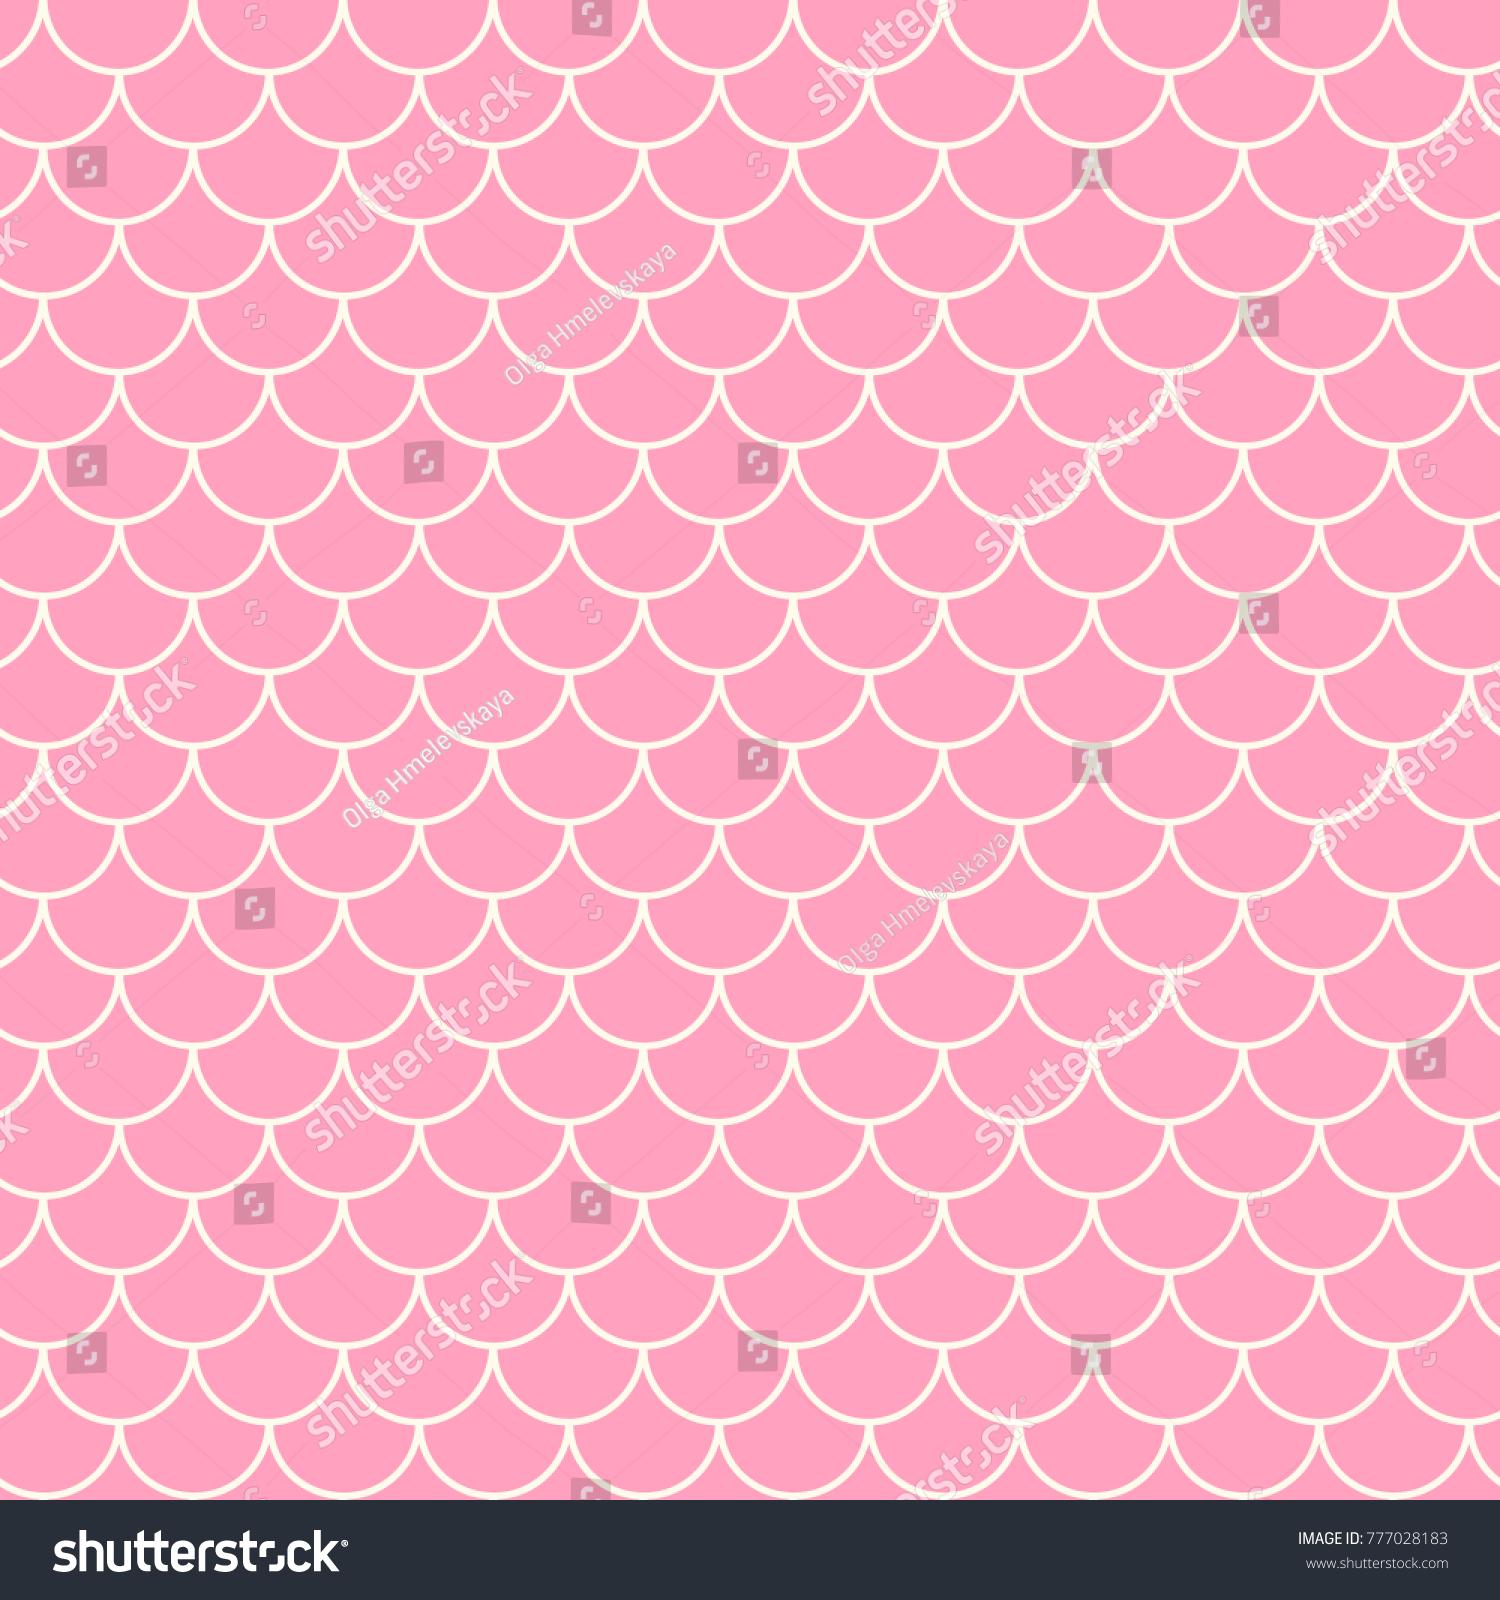 Little Mermaid Seamless Pattern Fish Skin 777028183